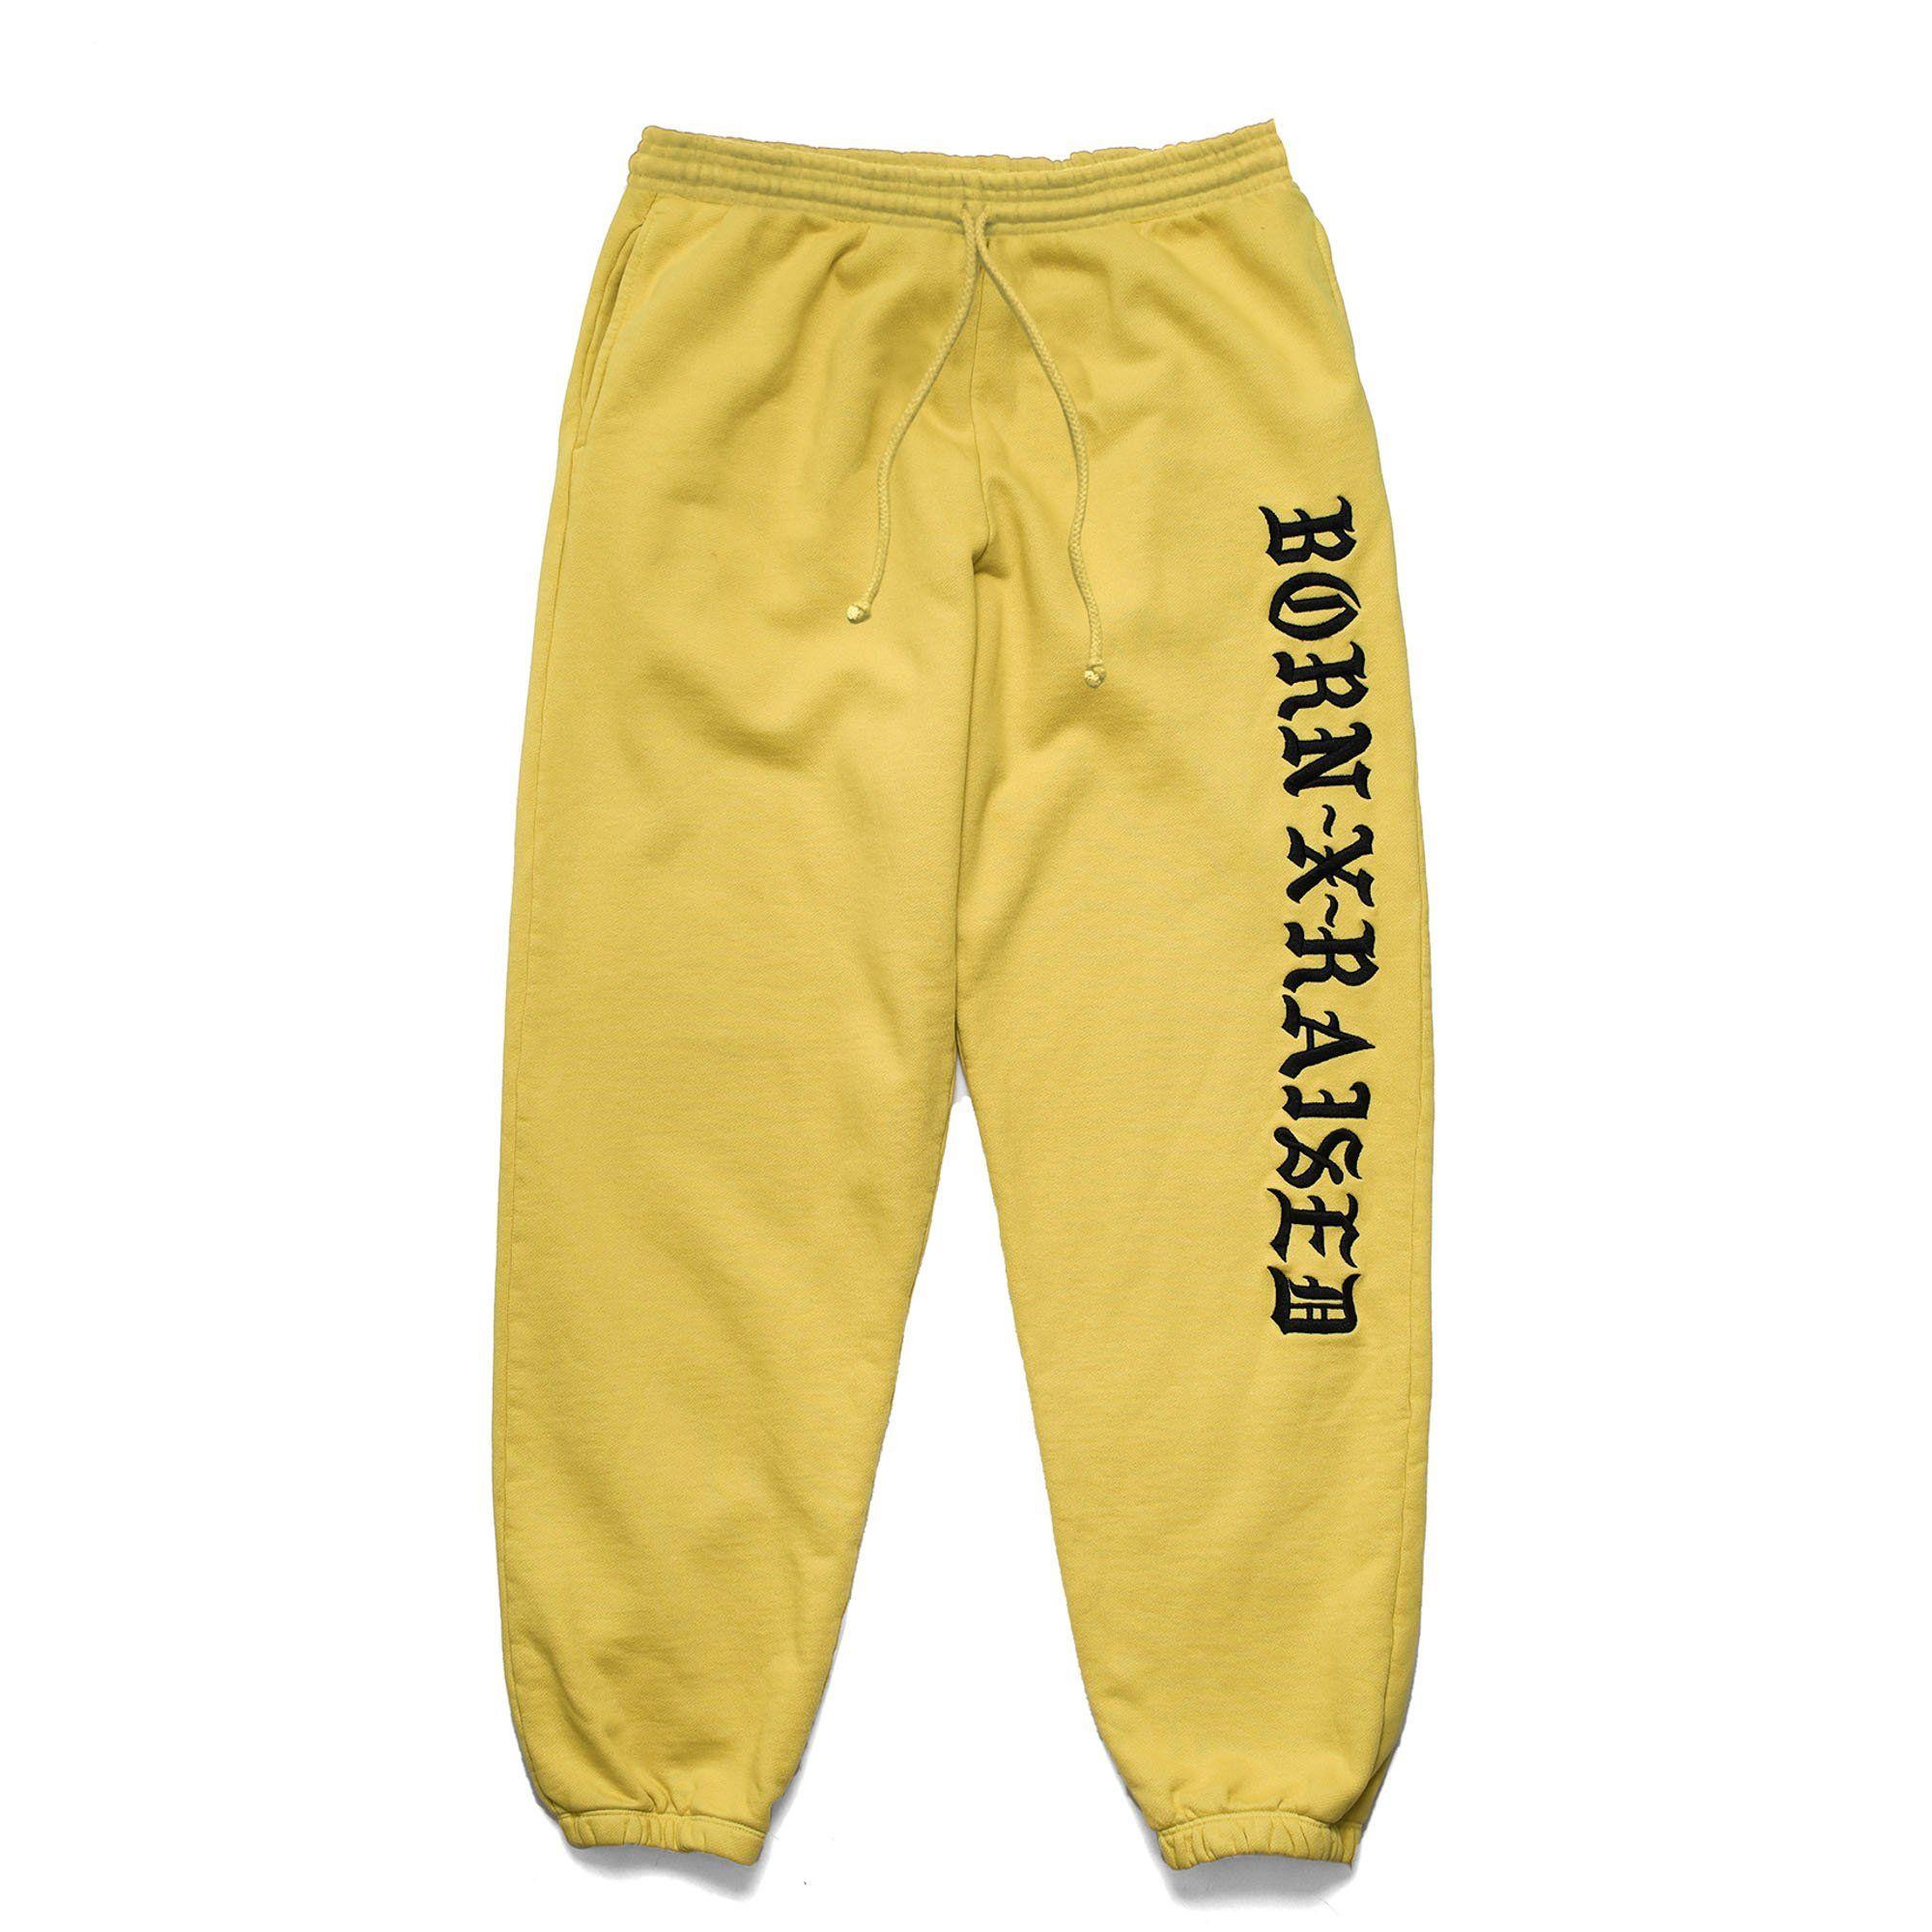 buy online 926e2 09cf3 BXR EMBROIDERED SWEATS MUSTARD YELLOW Mustard Yellow